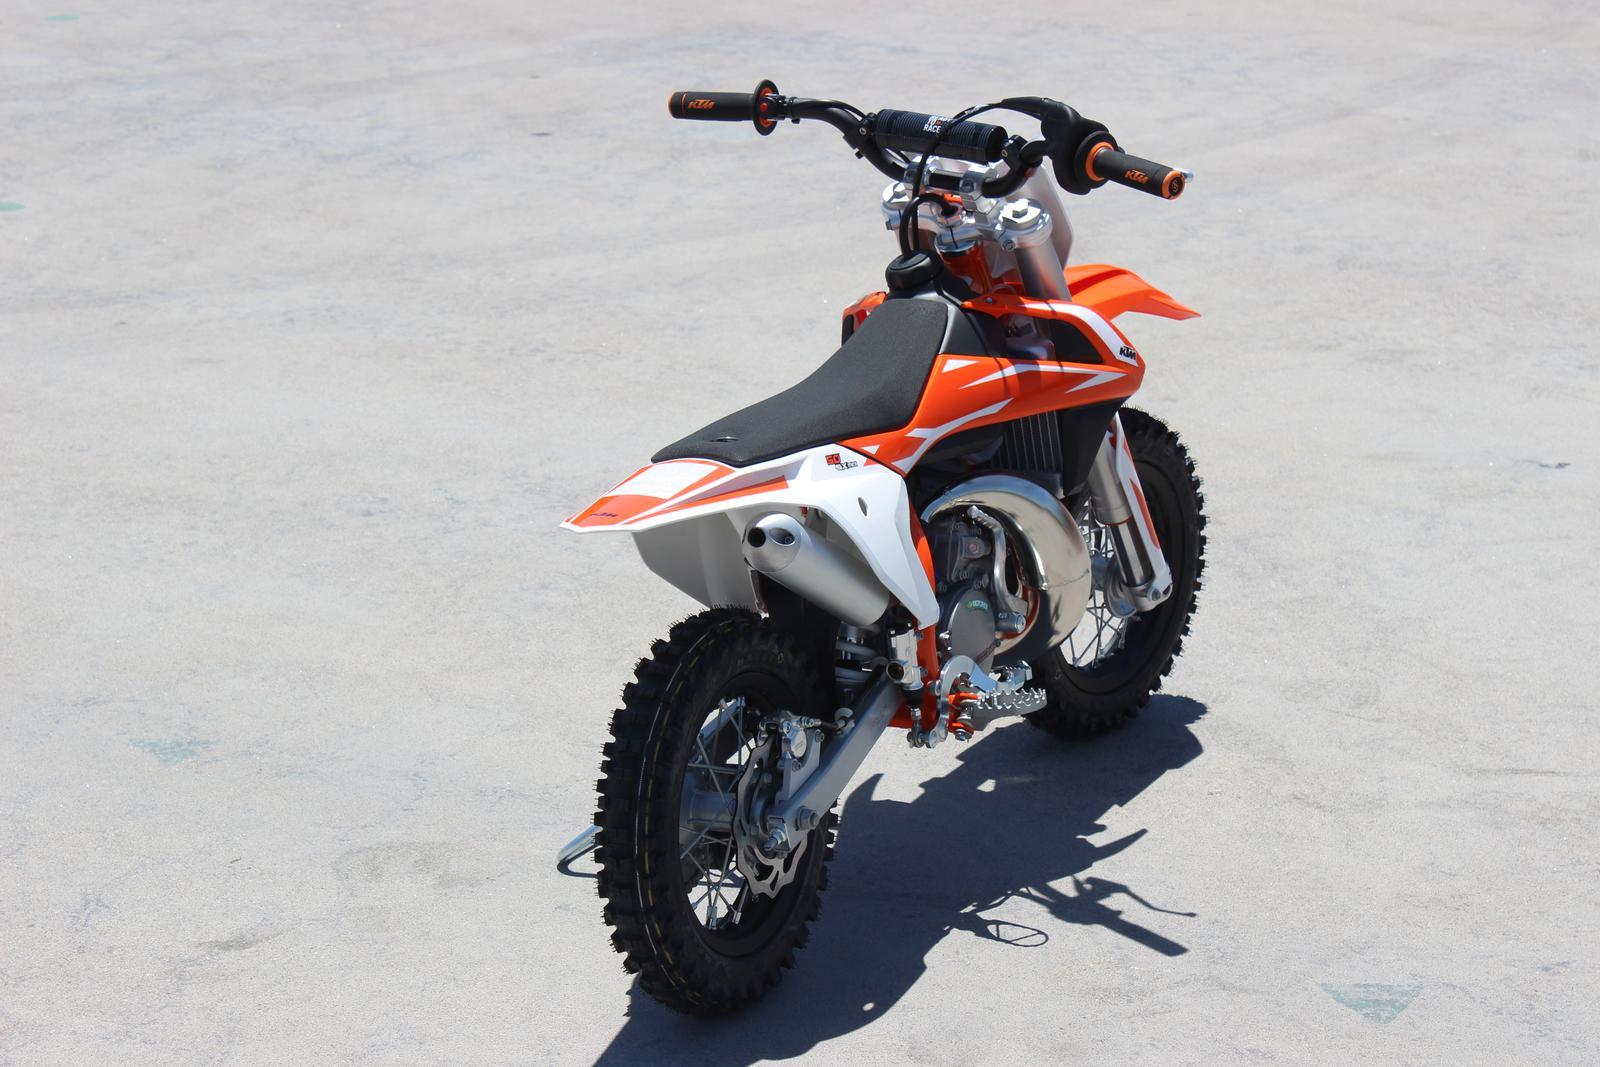 2018 ktm 50 sx mini for sale in scottsdale, az   go az motorcycles